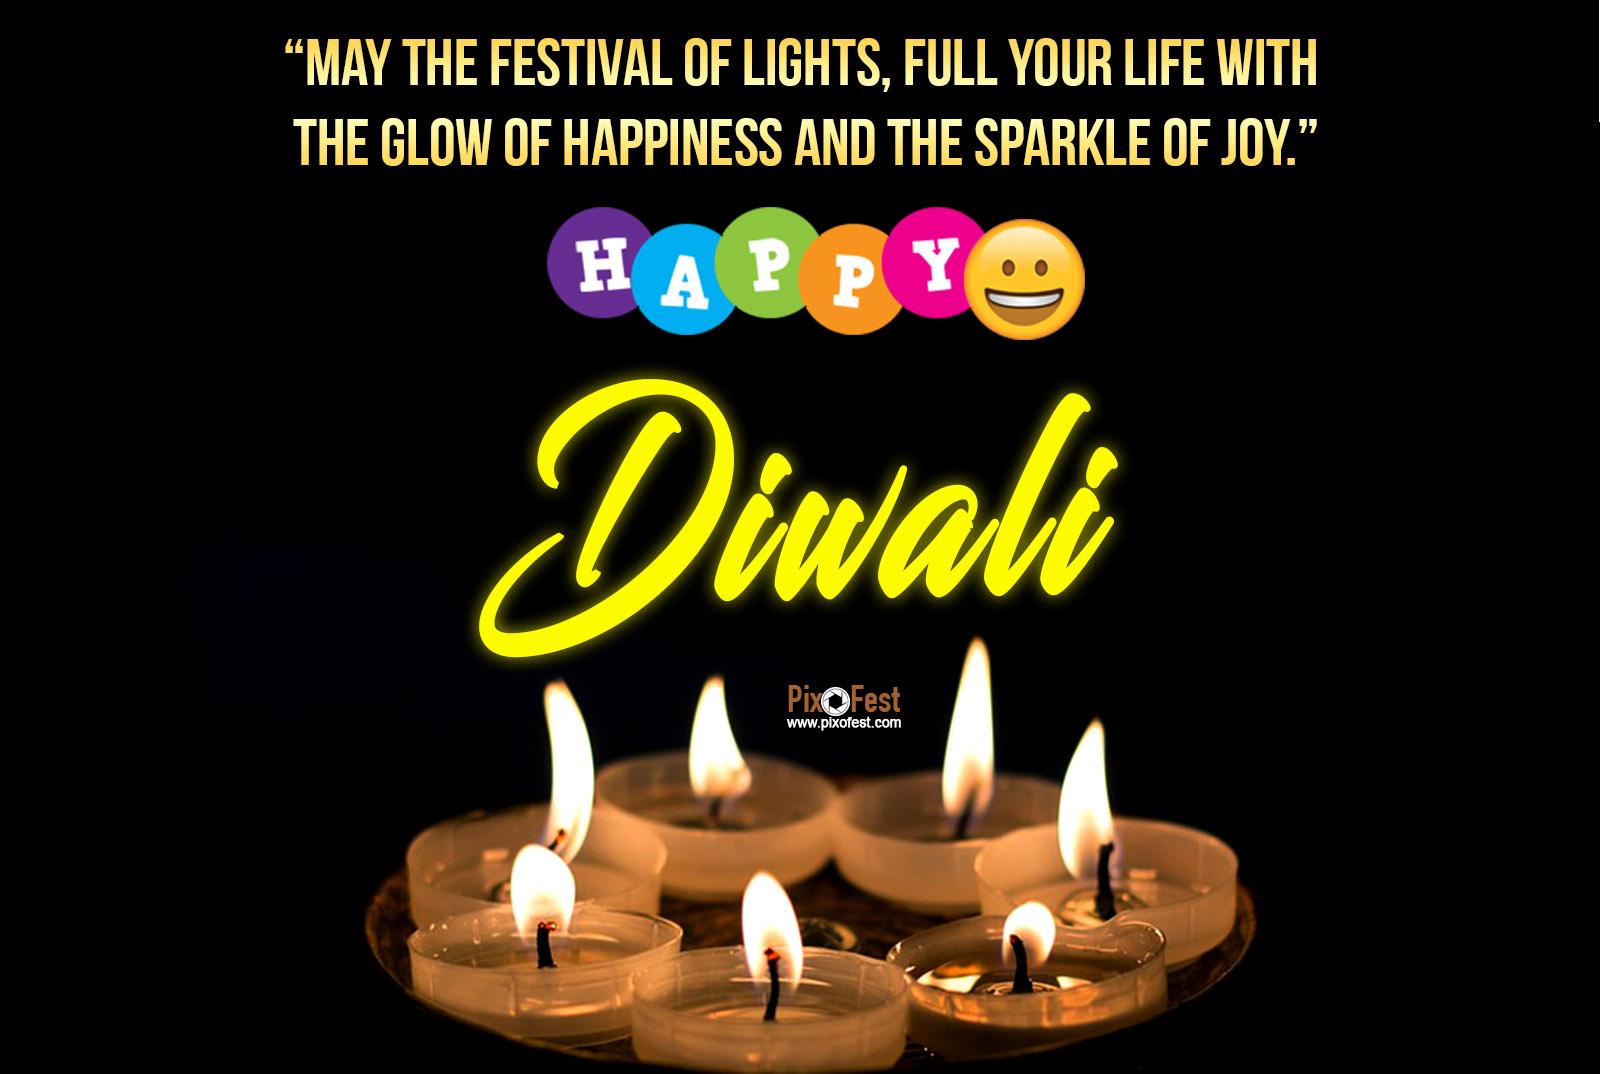 diwali,happydiwali,diwali2019,diwaliwish,light,diwalilight,happydiwali2019,diwaliphoto,happydiwaliwish,suvodipaboli,dipaboliwish,diwaliquotes,dipaboliquotes,pixofest